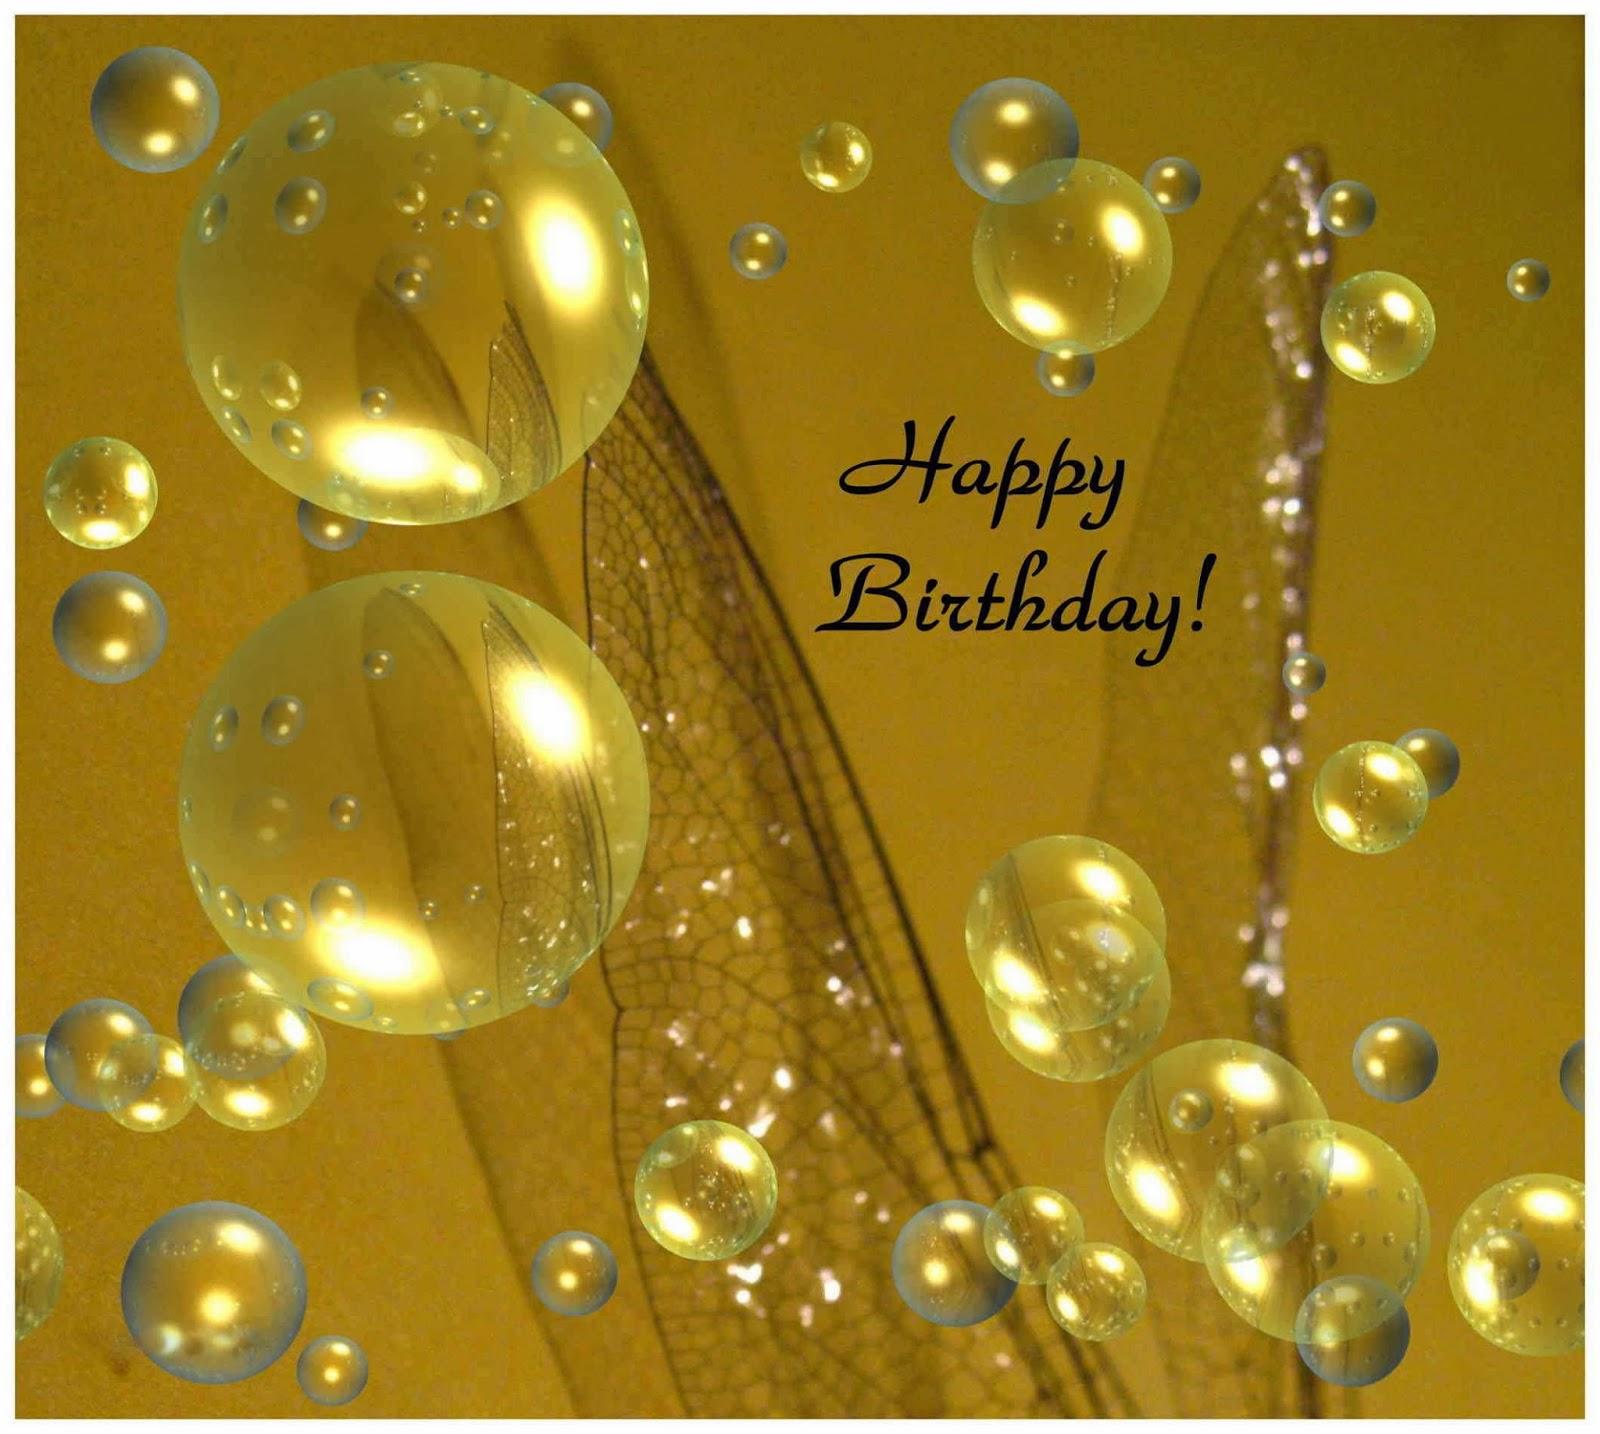 Happy Birthday Wallpaper Download Unique Wallpapers 1600x1434